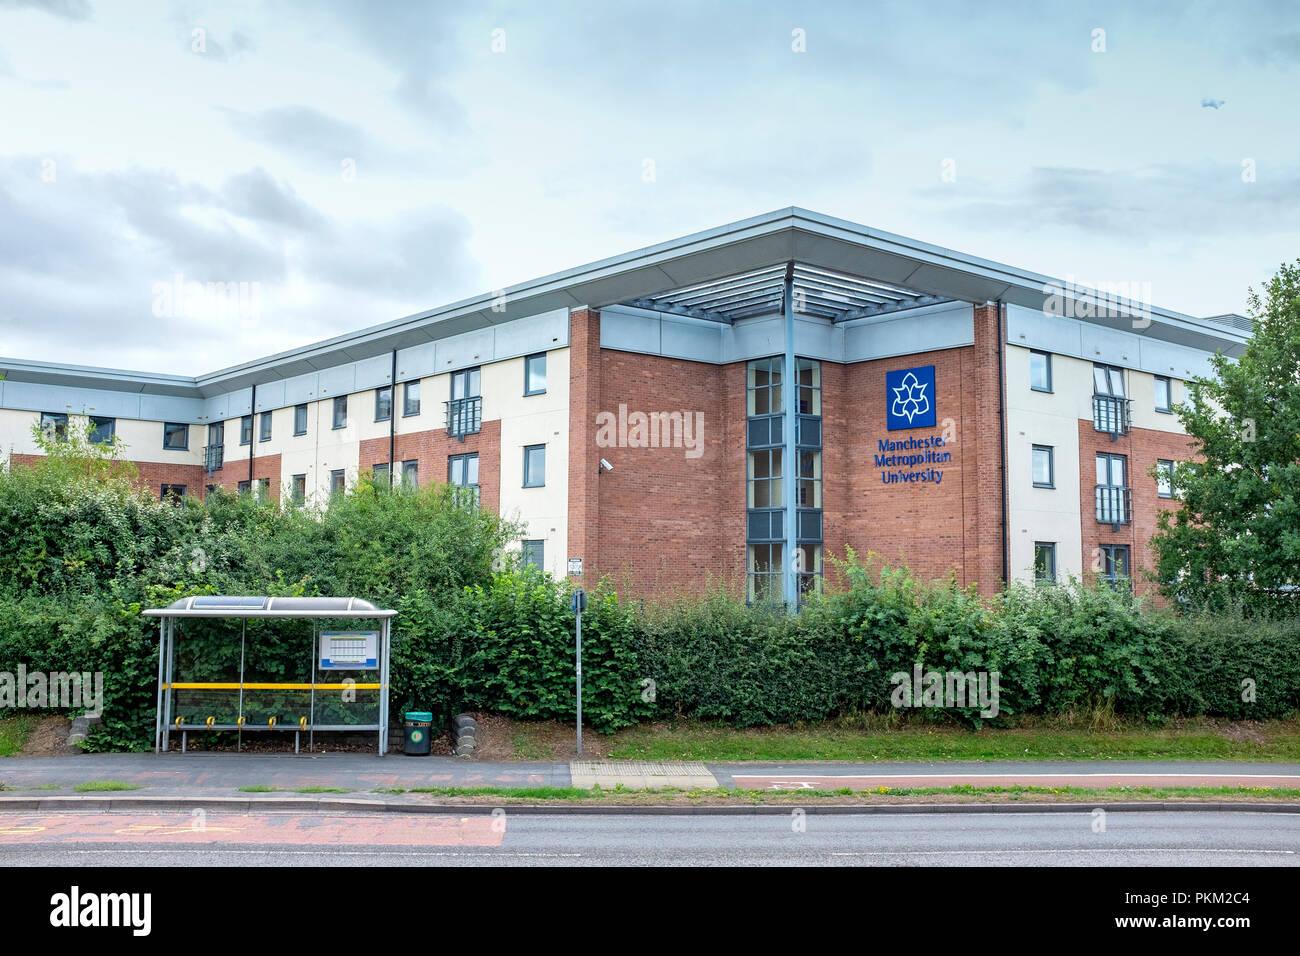 Manchester Metropolitan University in Crewe Cheshire UK - Stock Image